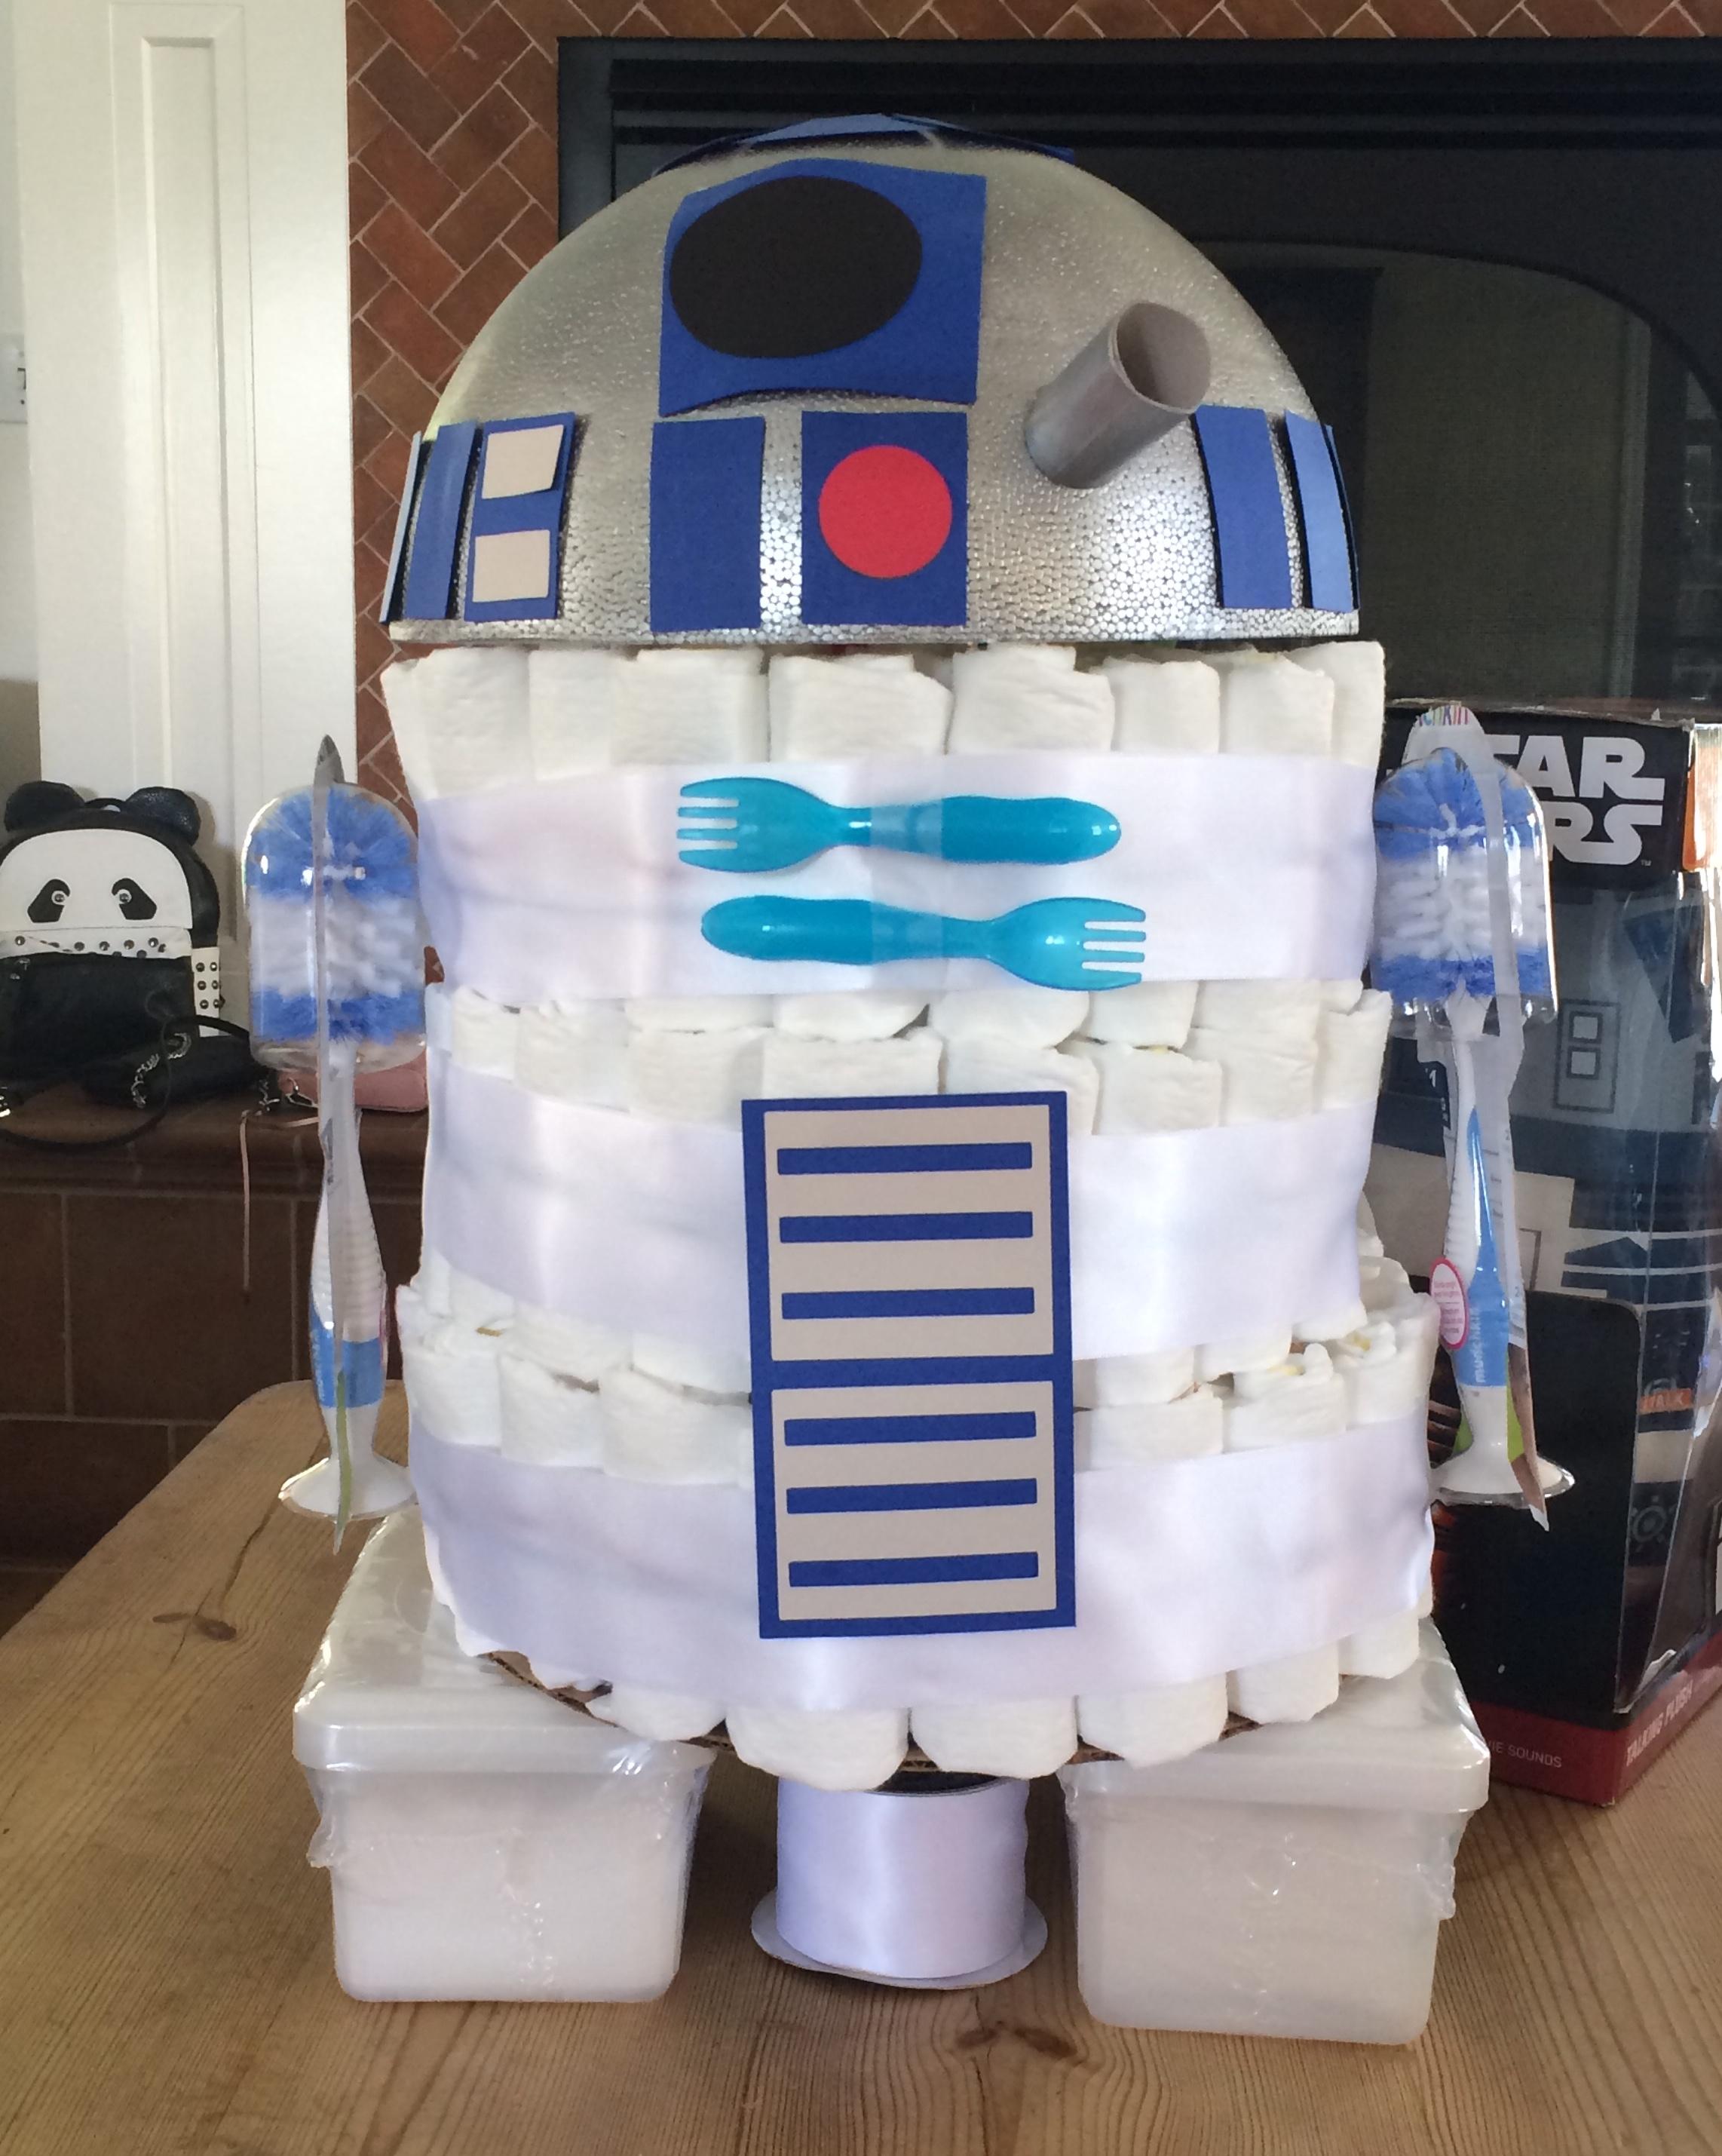 Cool diaper cakes: R2D2 diaper cake | Pinterest